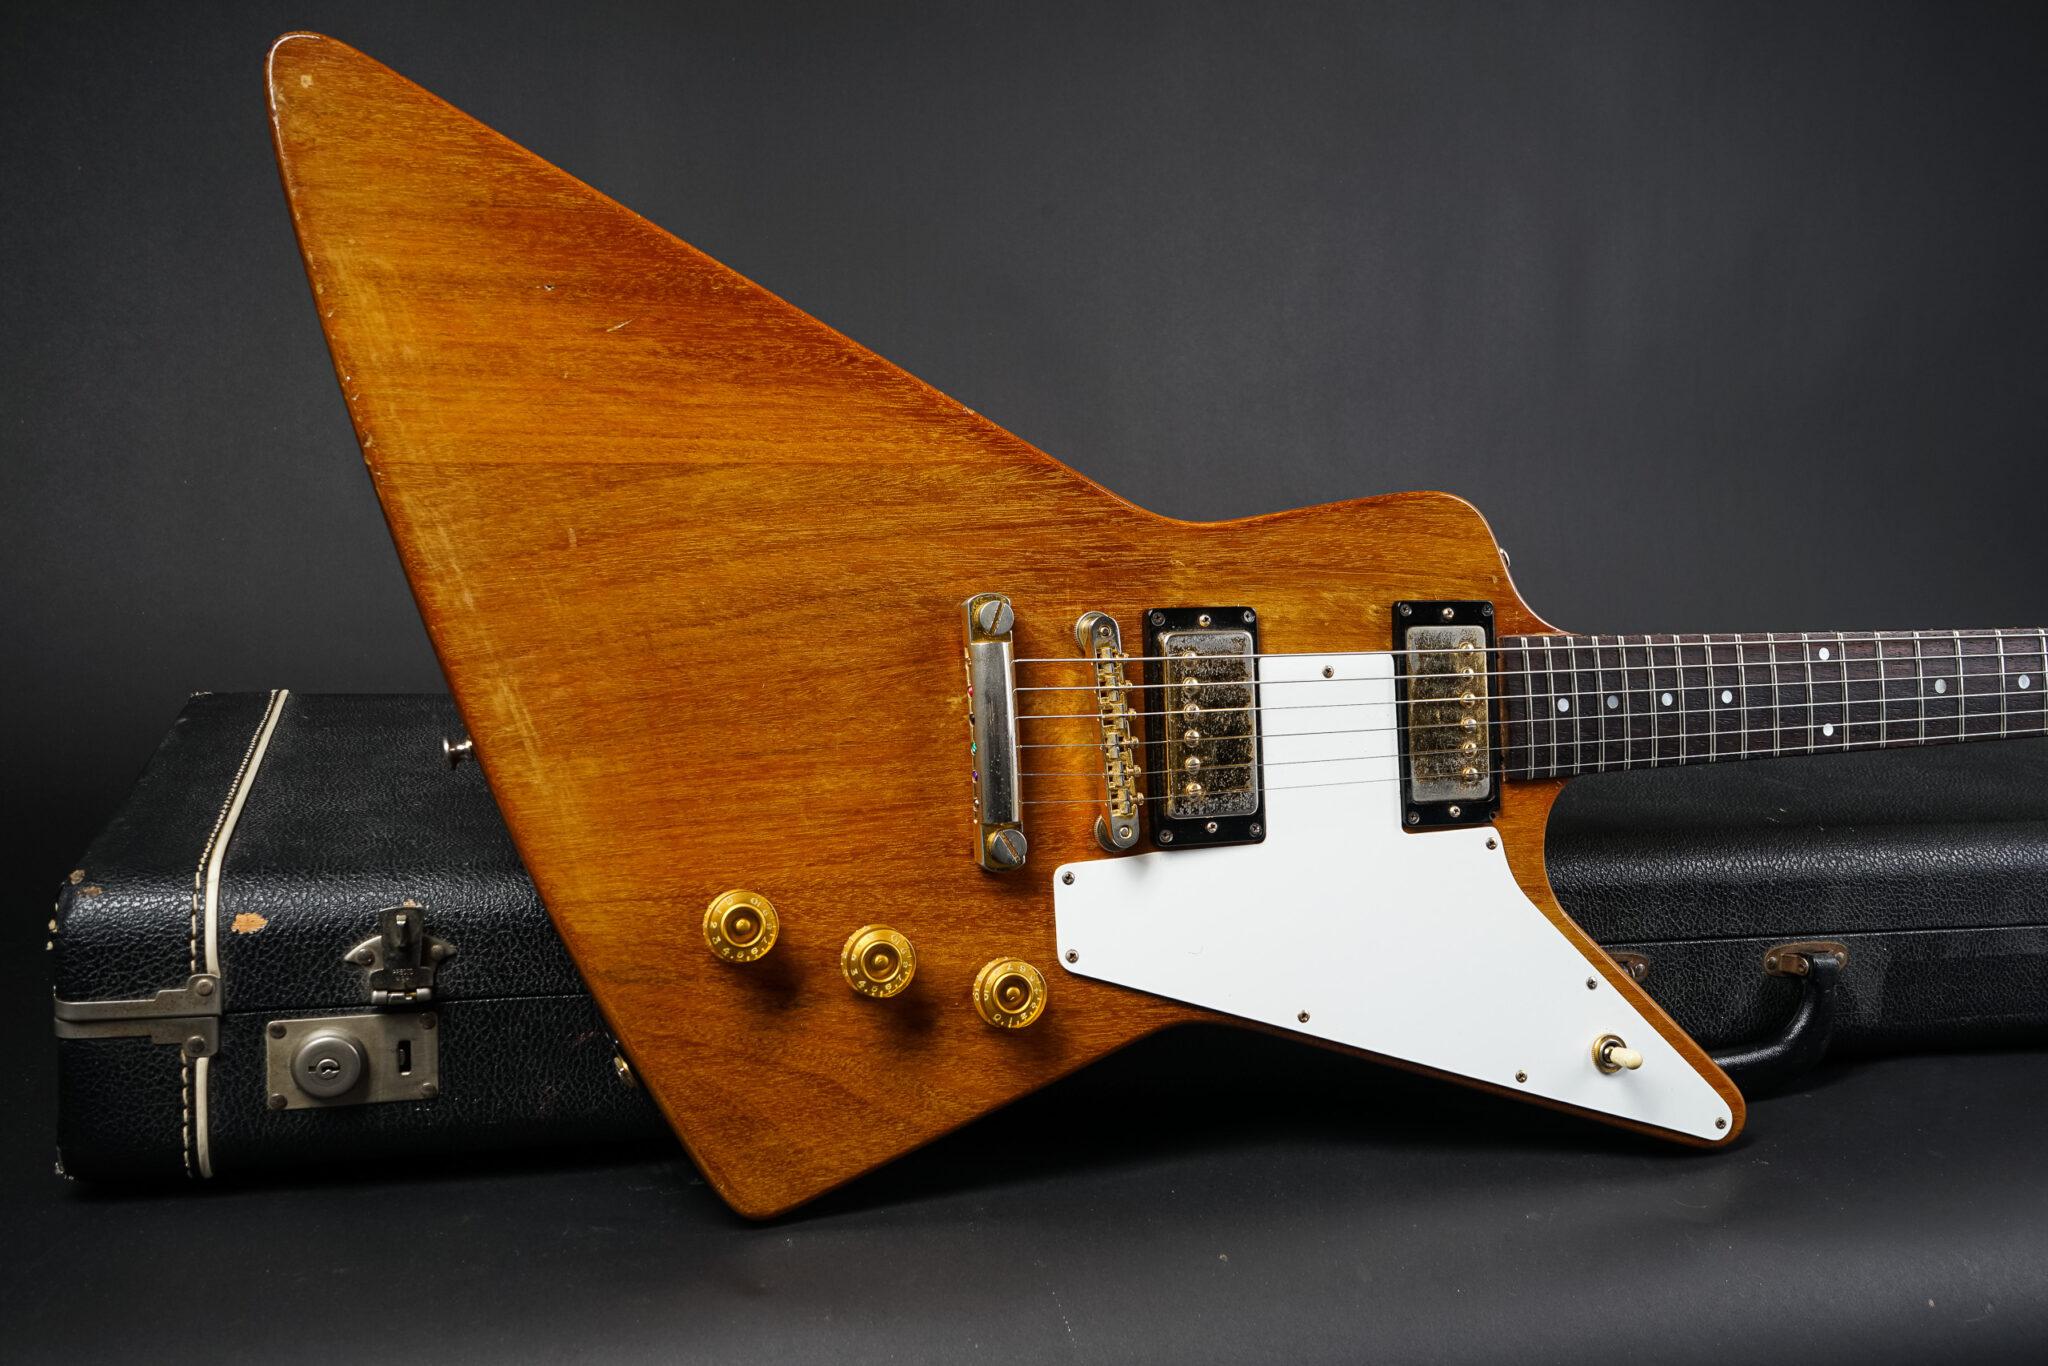 https://guitarpoint.de/app/uploads/products/1976-gibson-explorer-06247072/1977-Gibson-Explorer-Natural-06247072-9-2048x1366.jpg